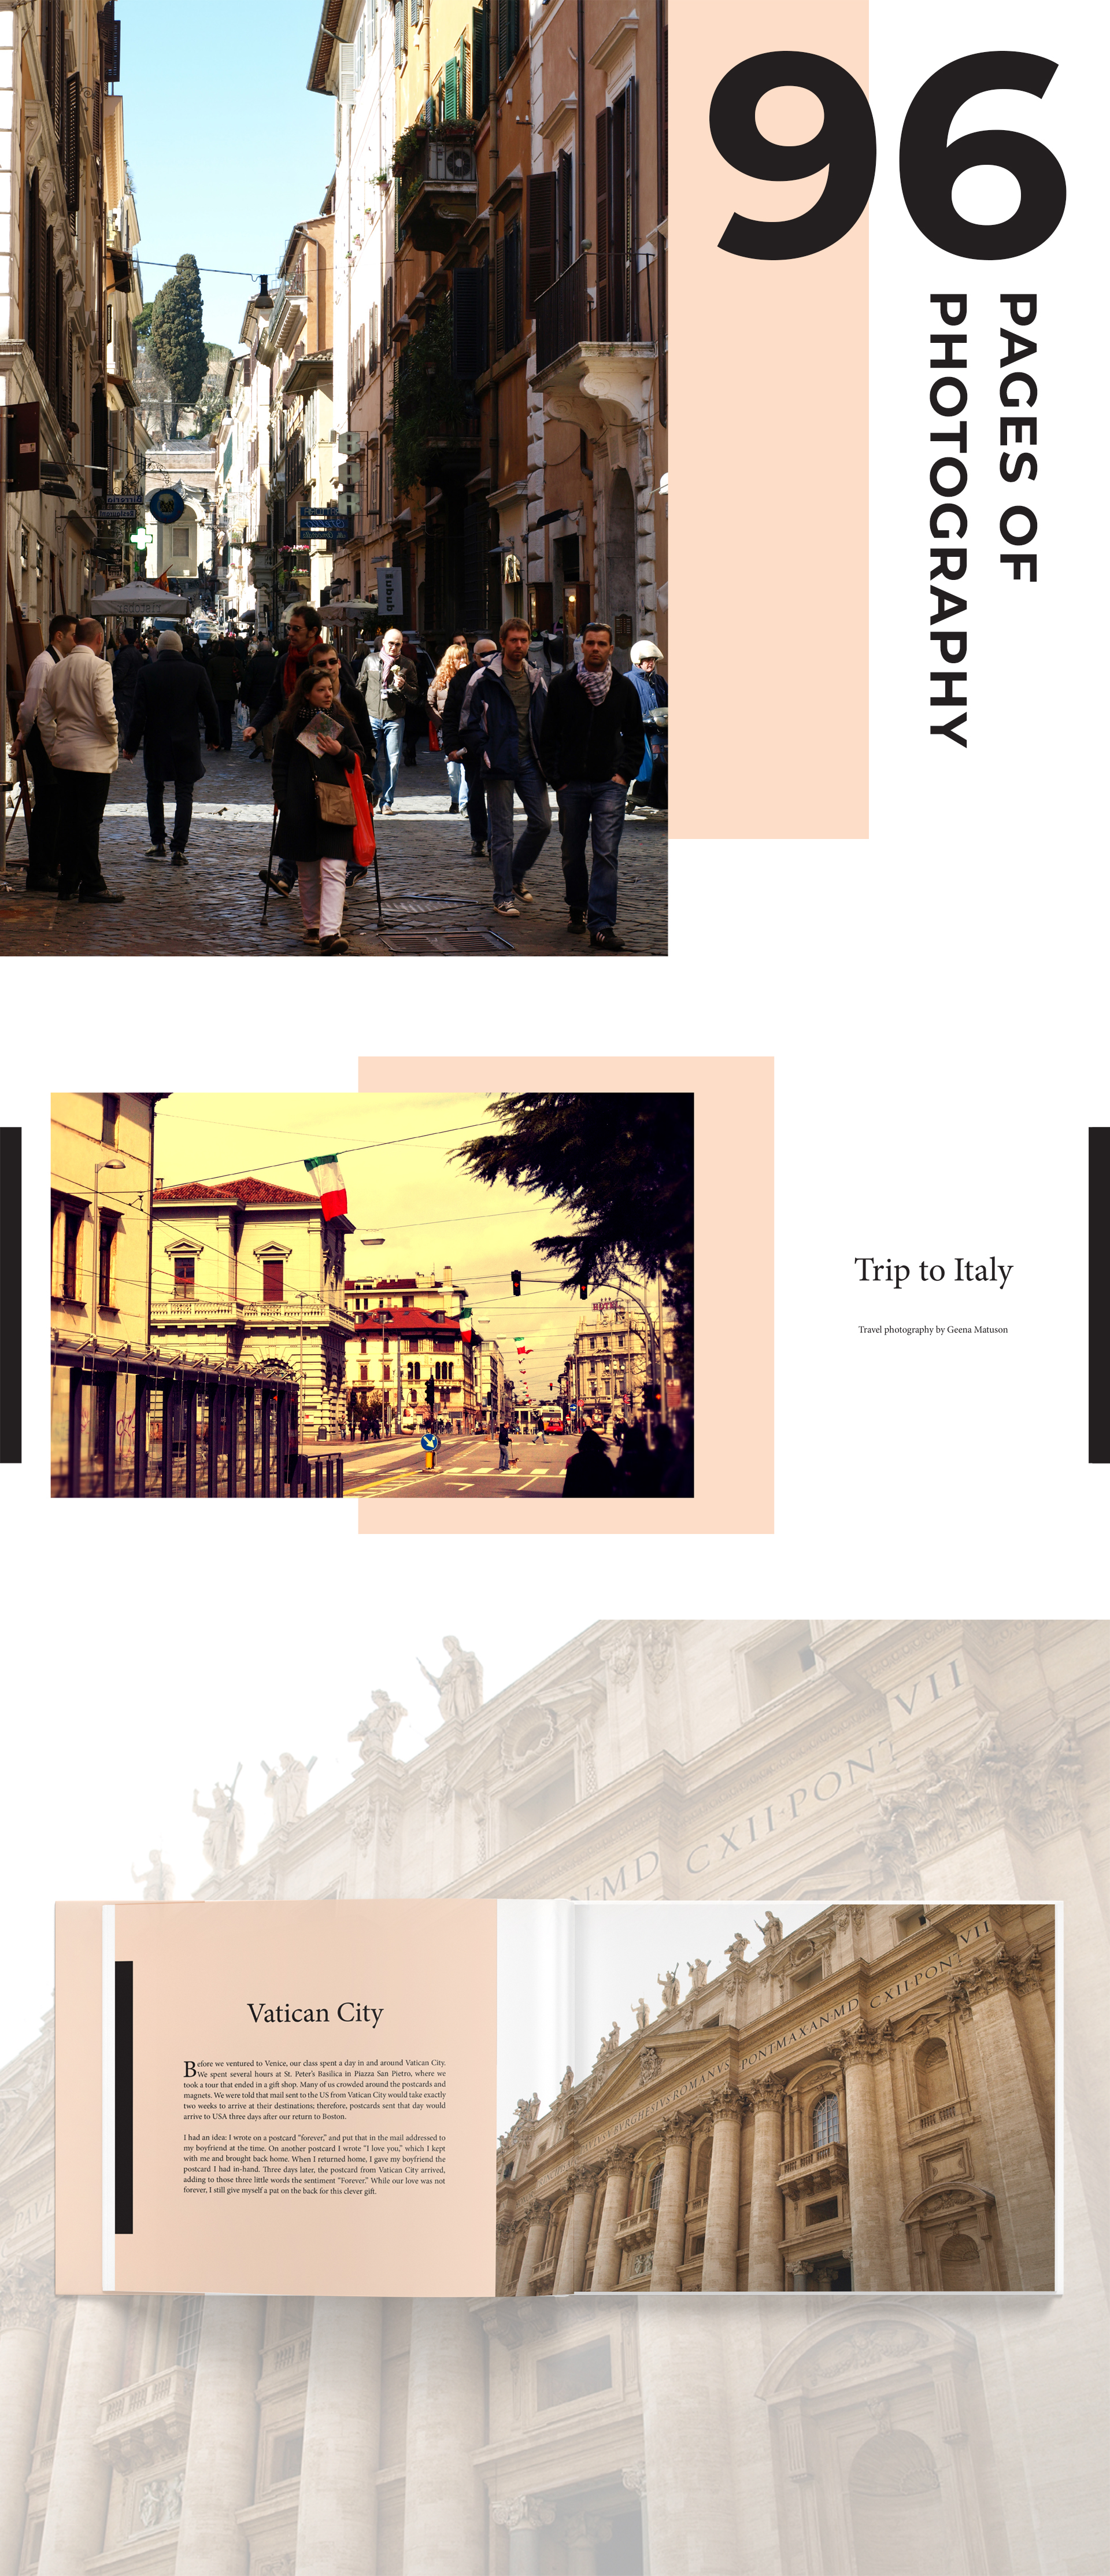 GeenaMatuson_TheGirlMirage_Trip-to-Italy_Book_02.jpg